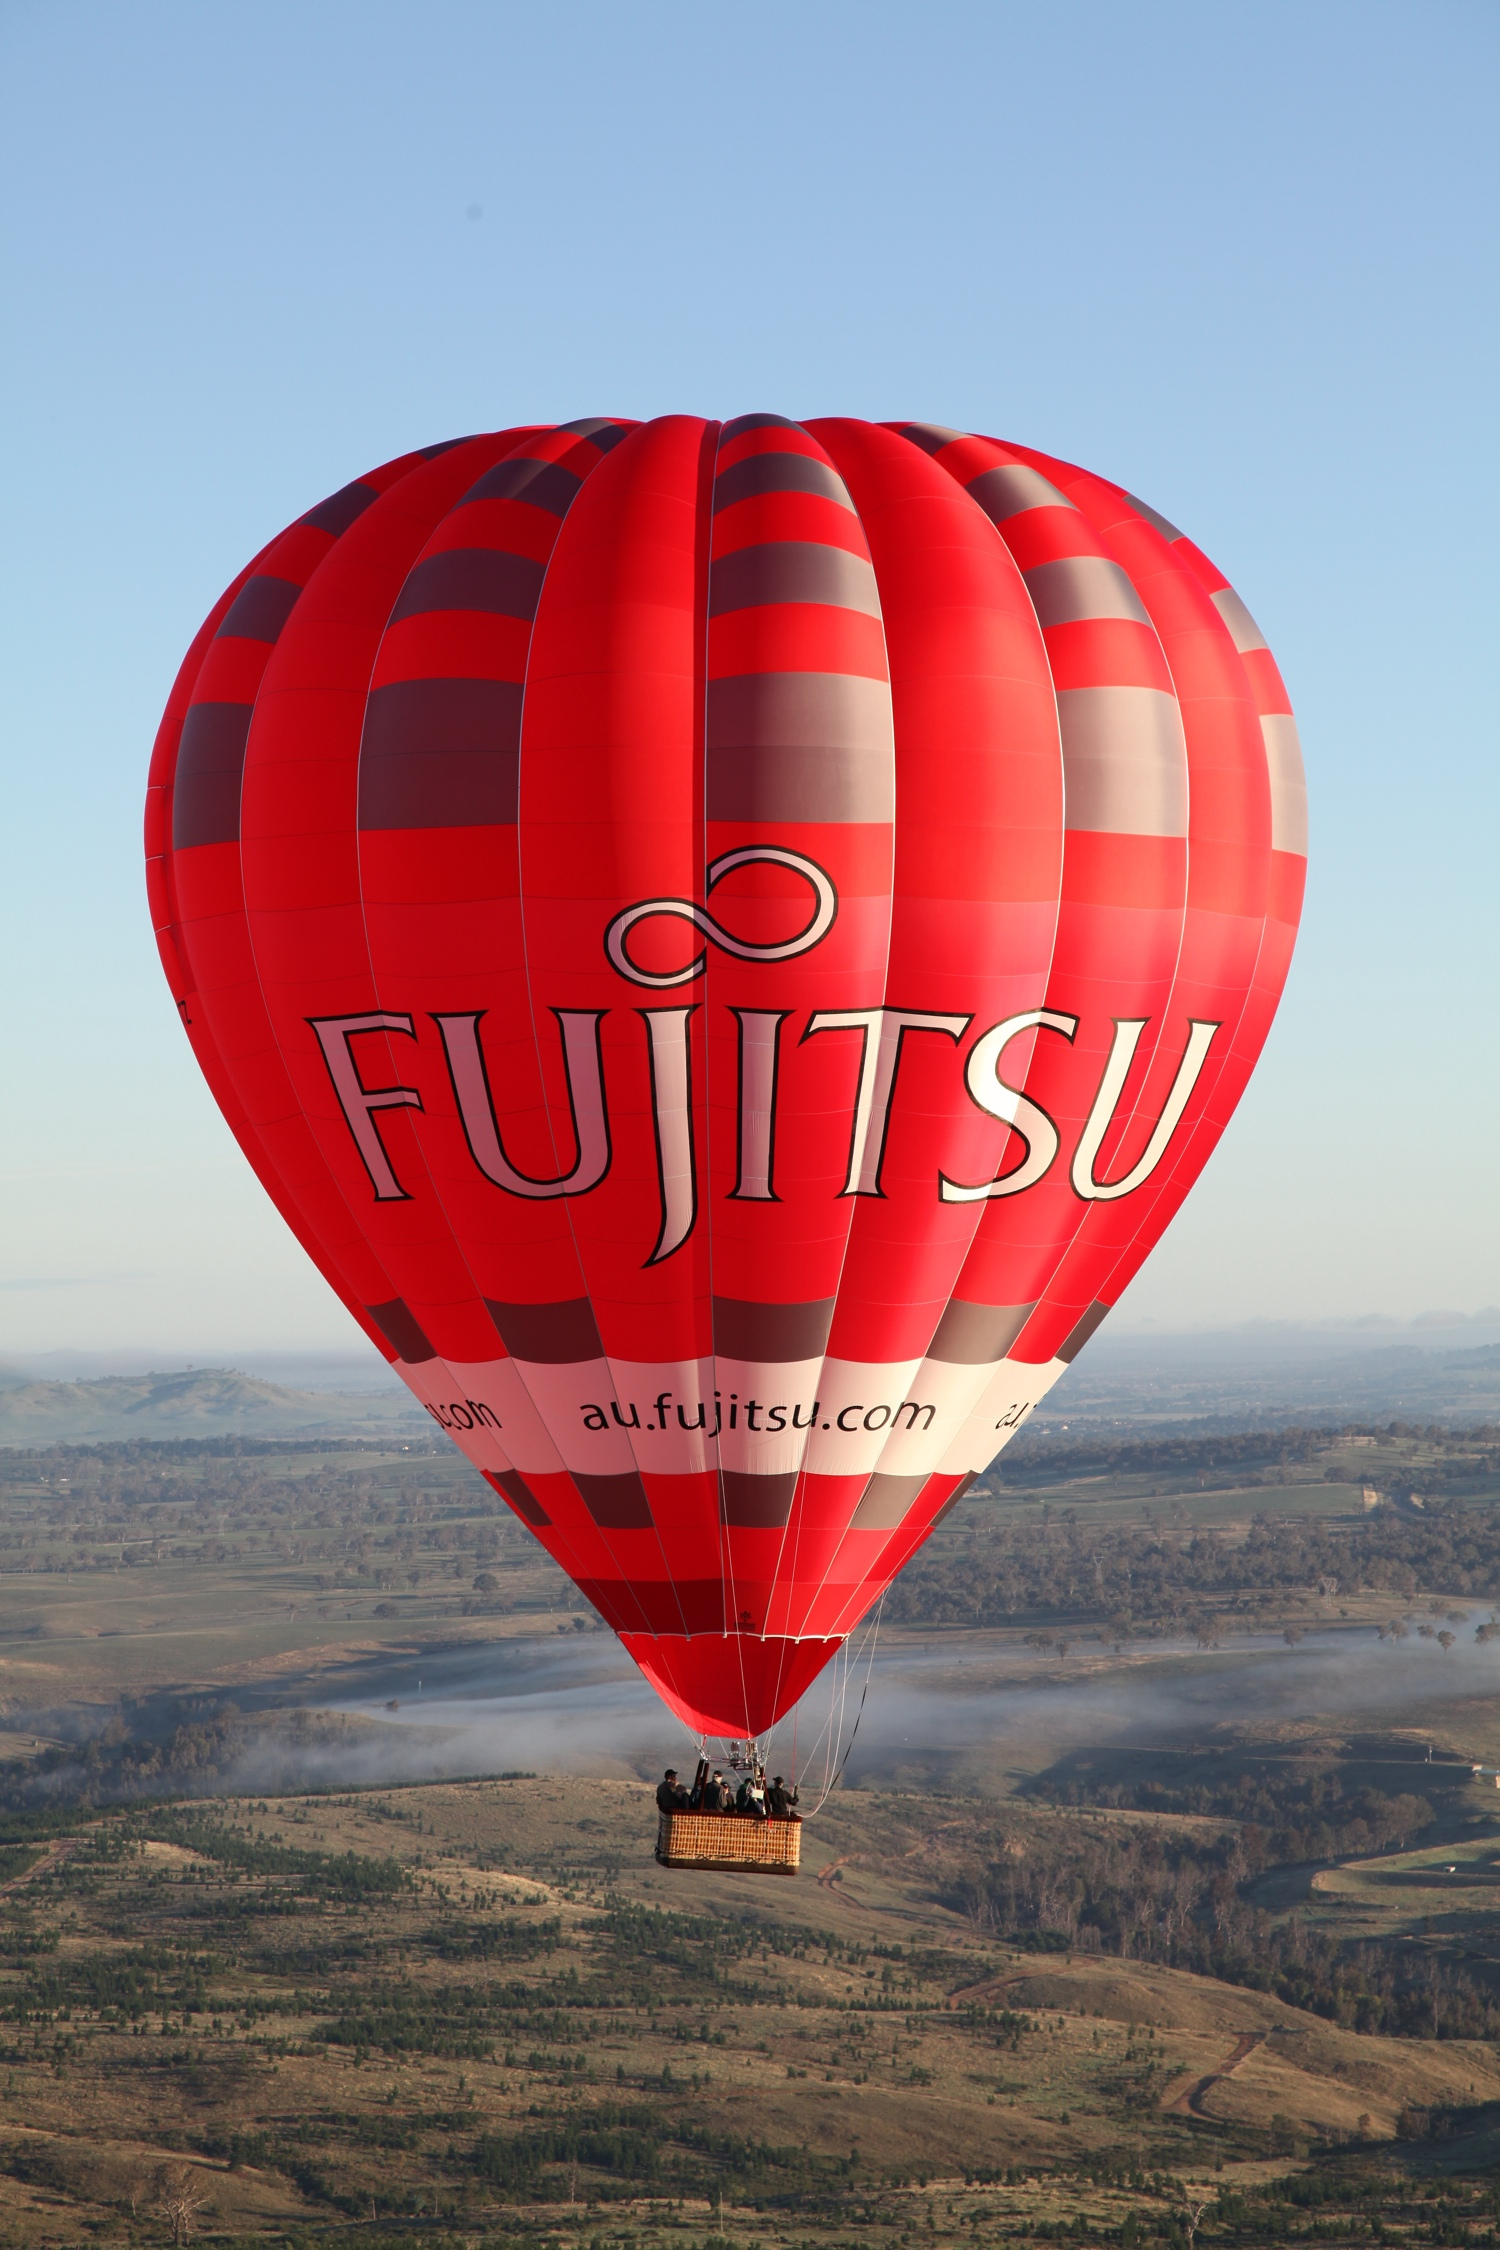 Fujitsu hot air balloon over countryside.jpeg